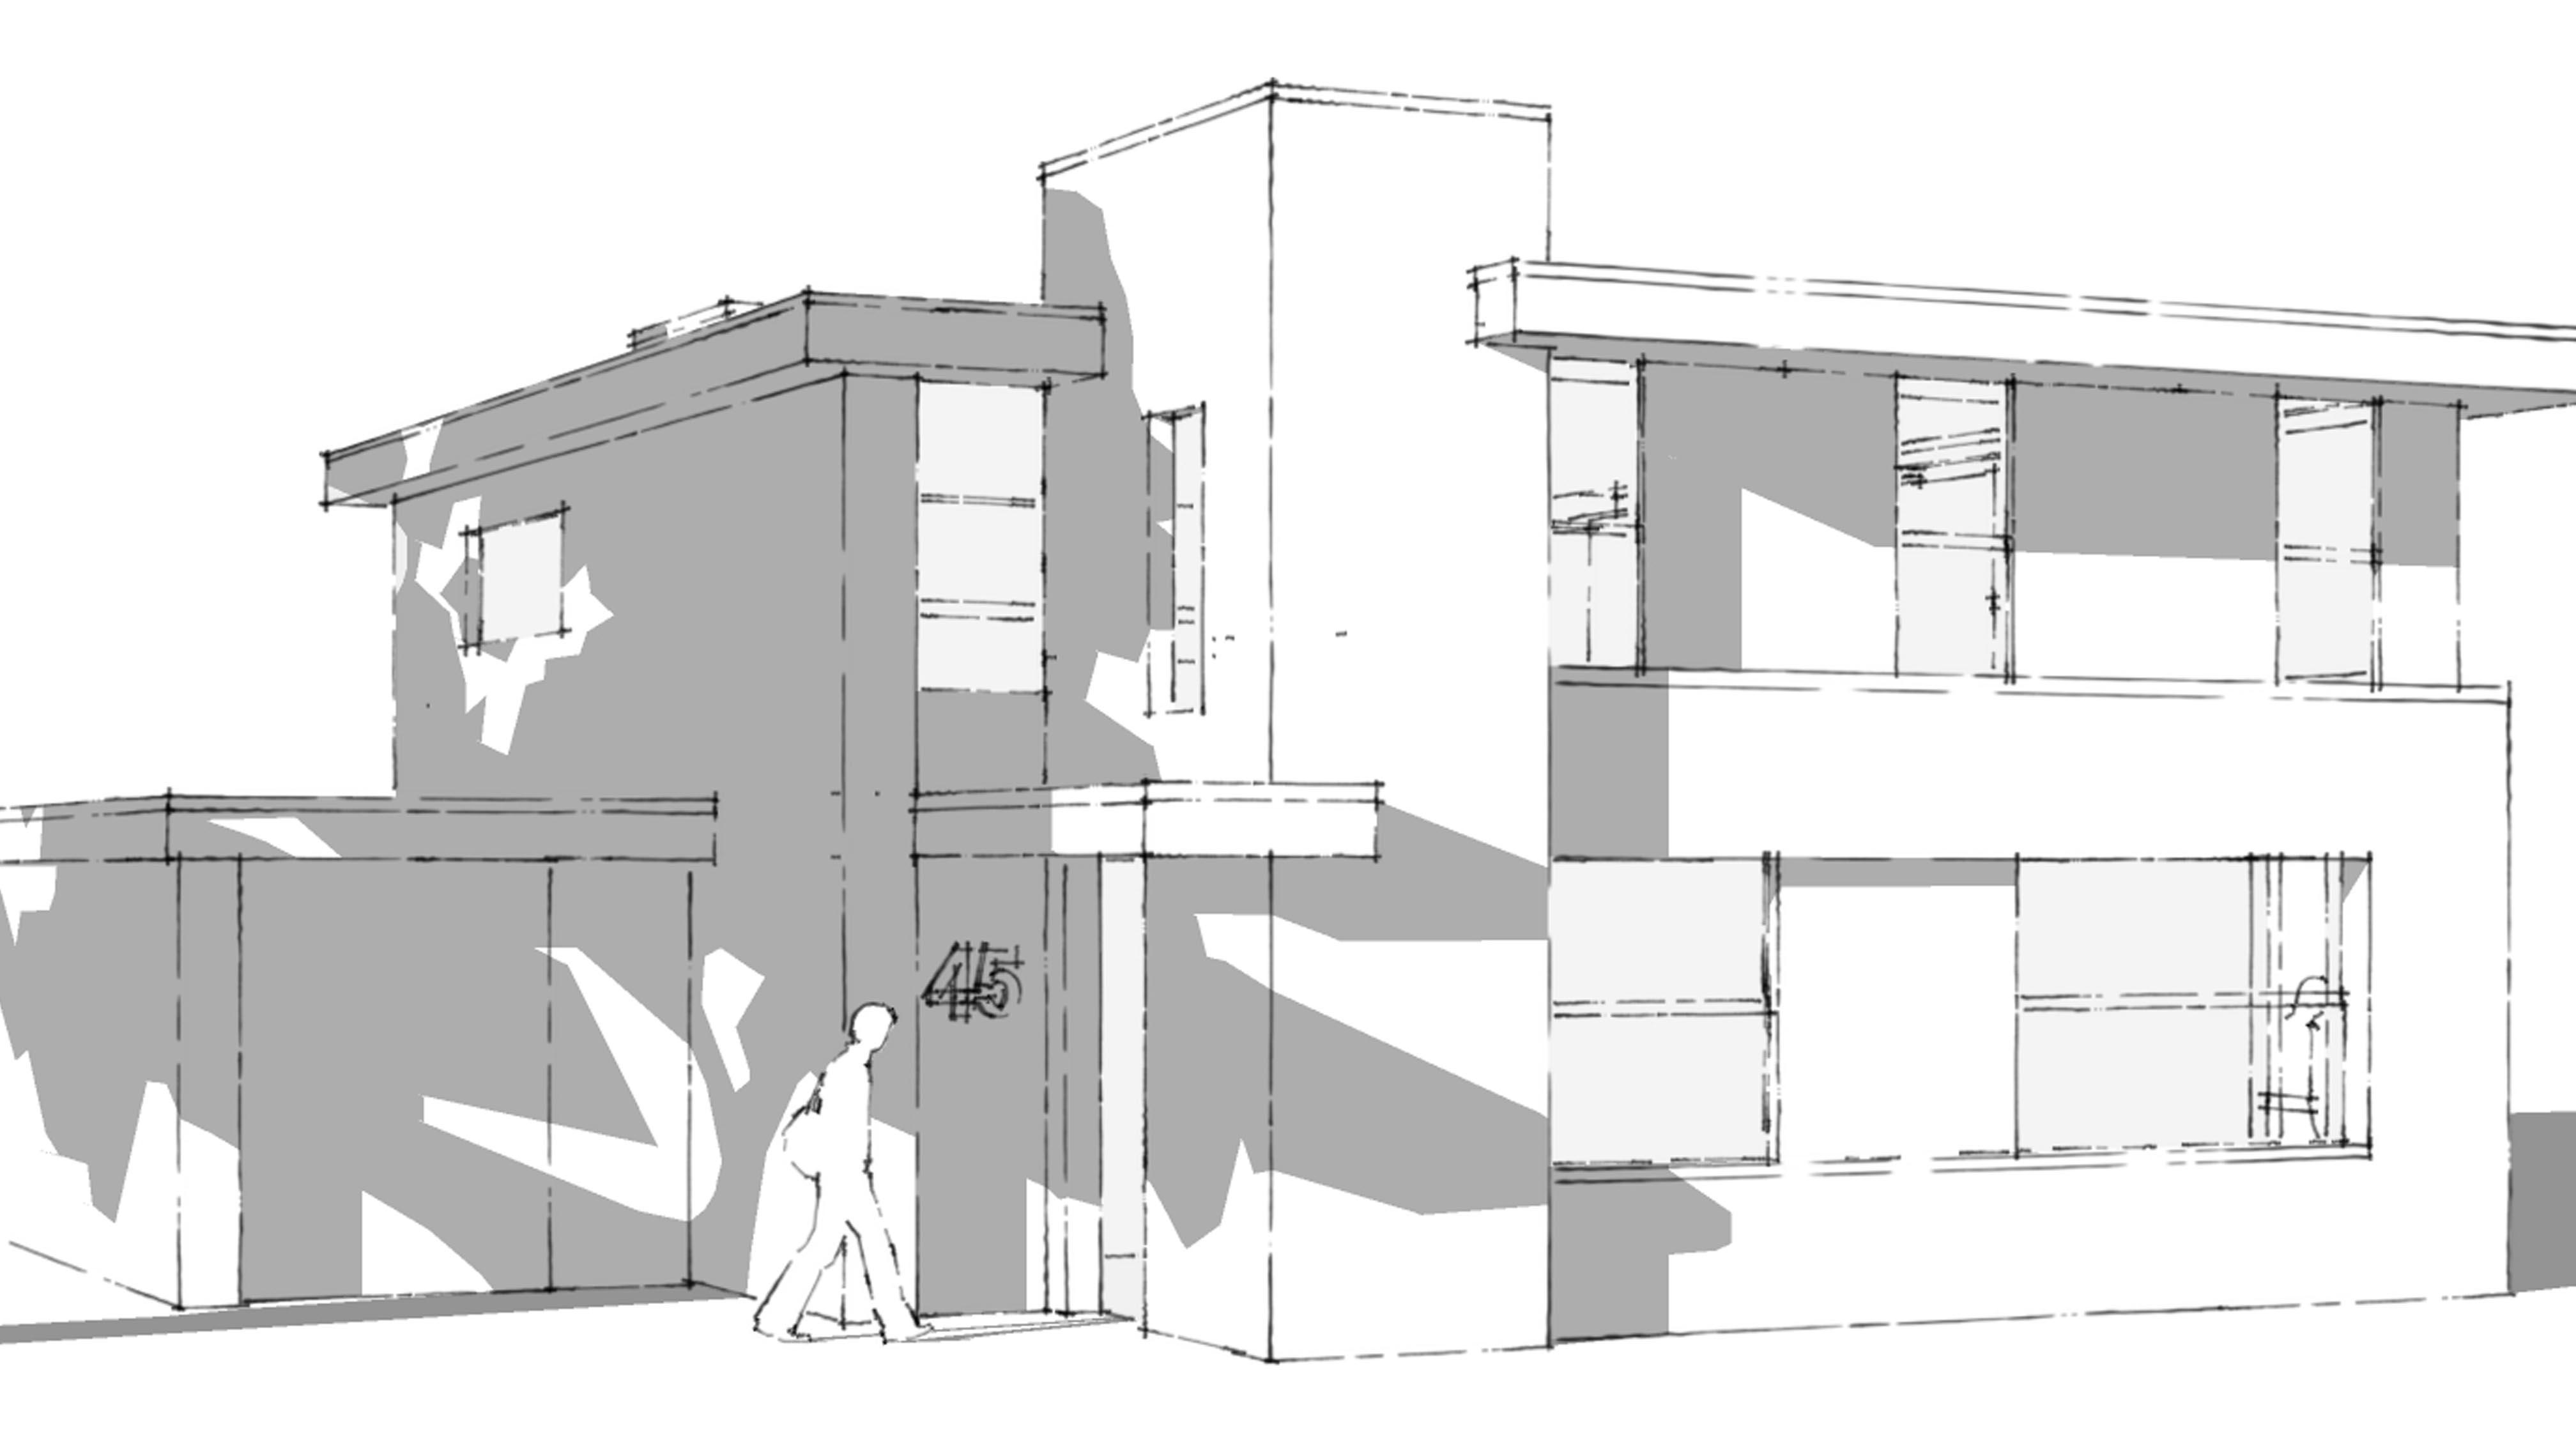 Stijlarchitectuur - Project Dubbelsteyn west - Dubbeldam - Detail getekend - zwart wit